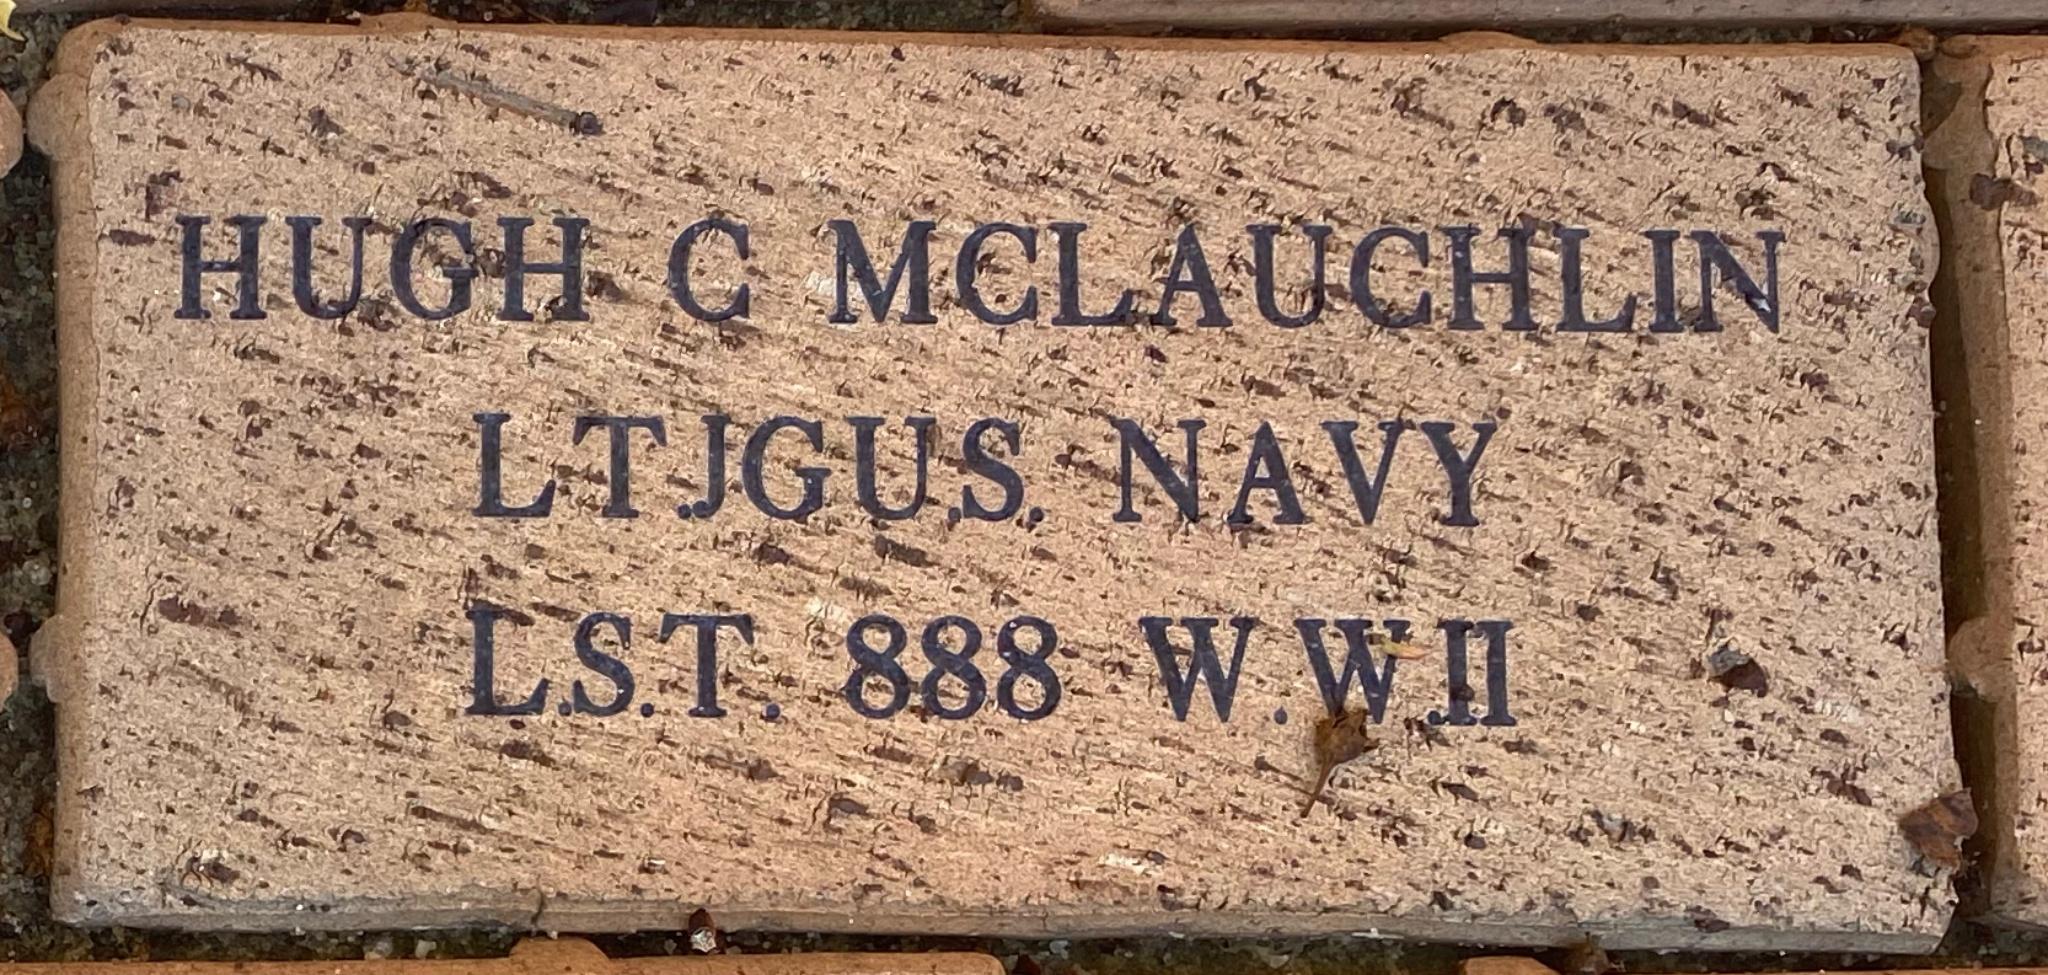 HUGH C. MCLAUGHLIN LT. JGU.S. NAVY L.S.T. 888 W.W. II